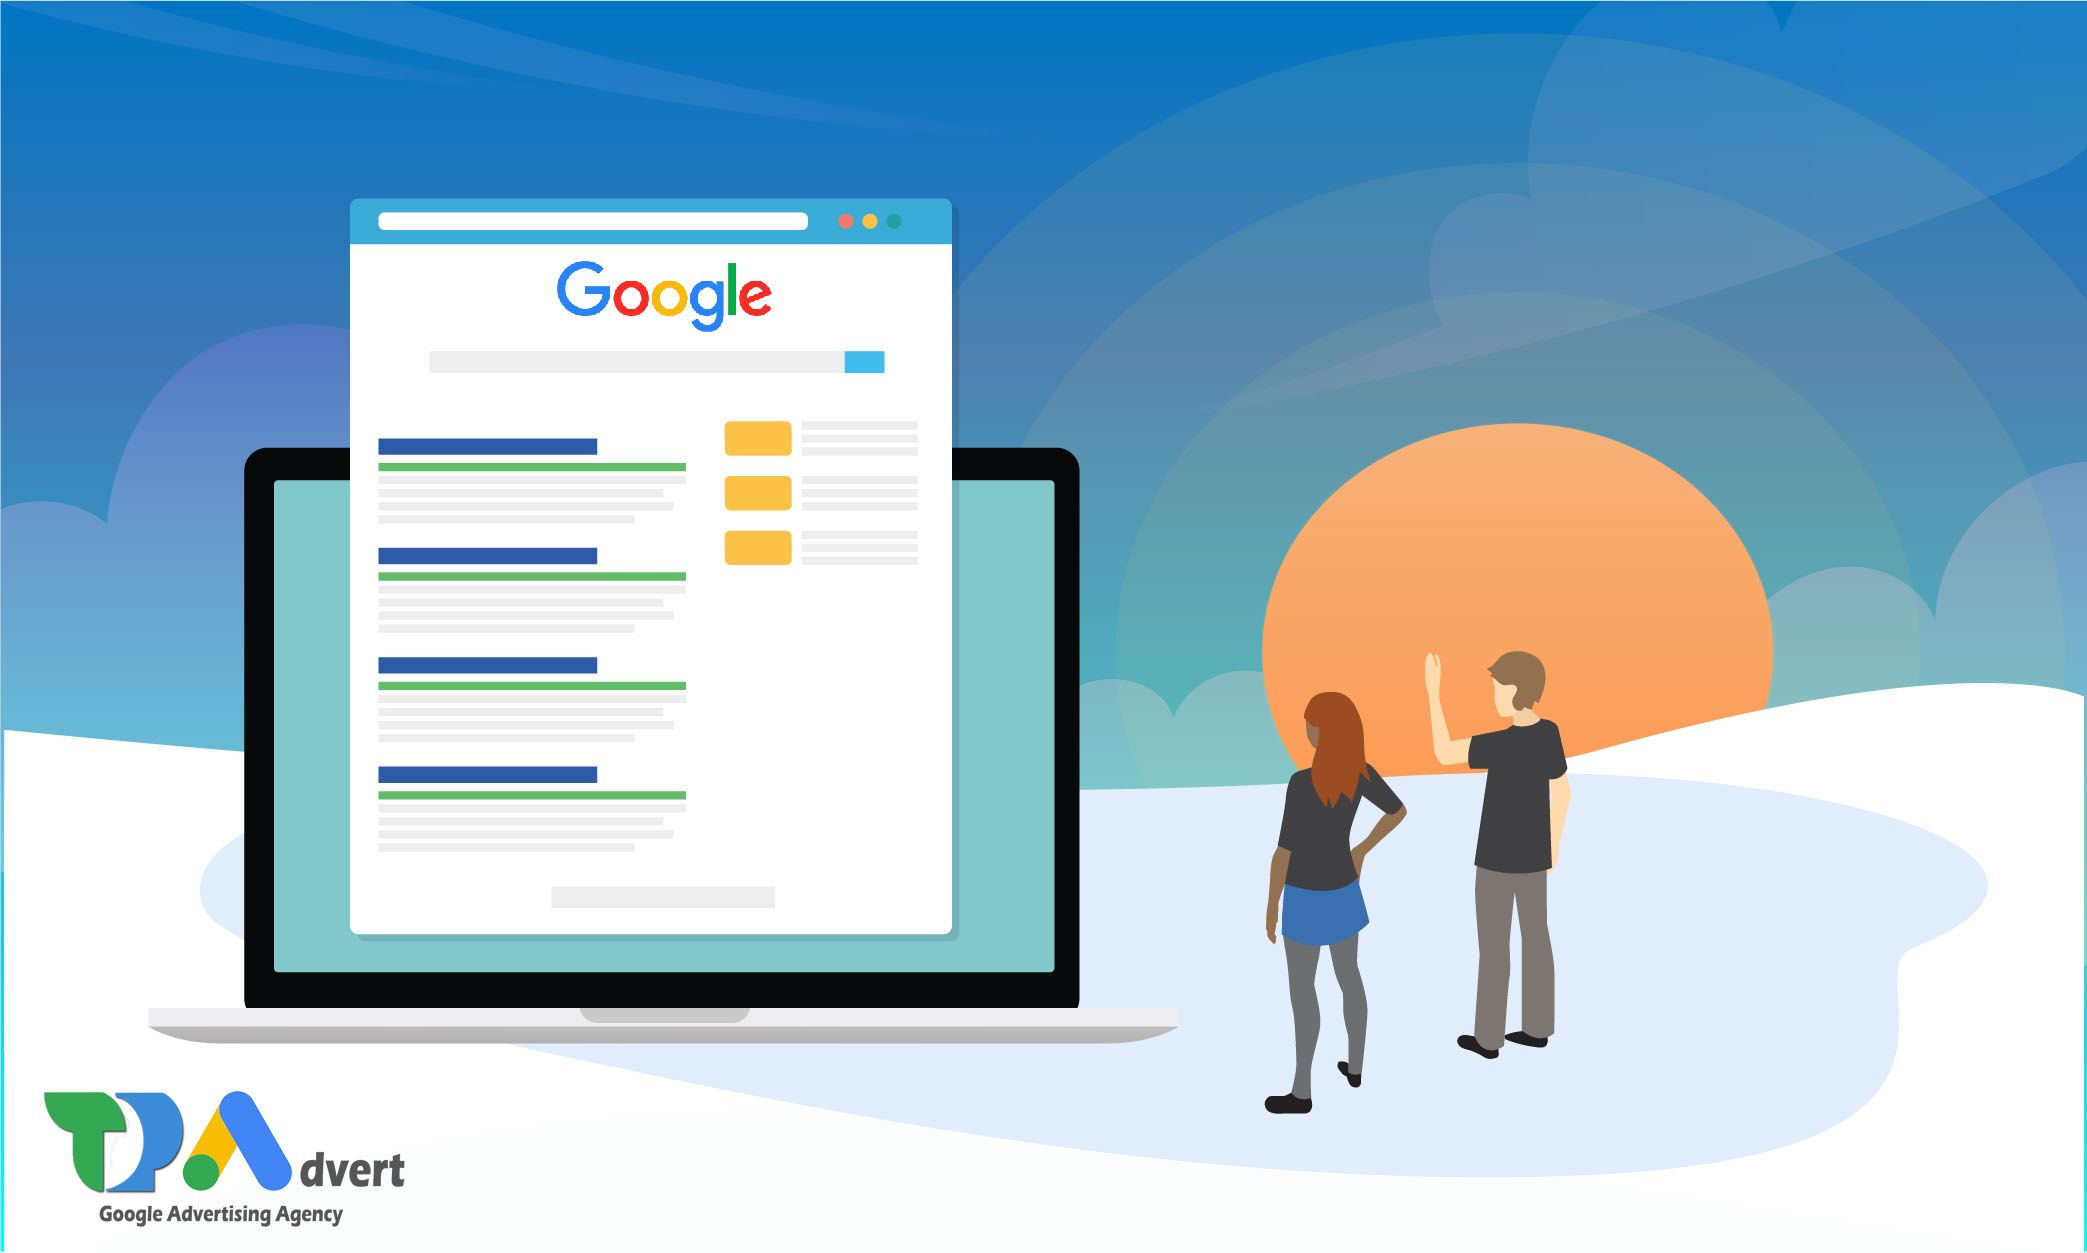 مجری برتر تبلیغات گوگل ادوردز